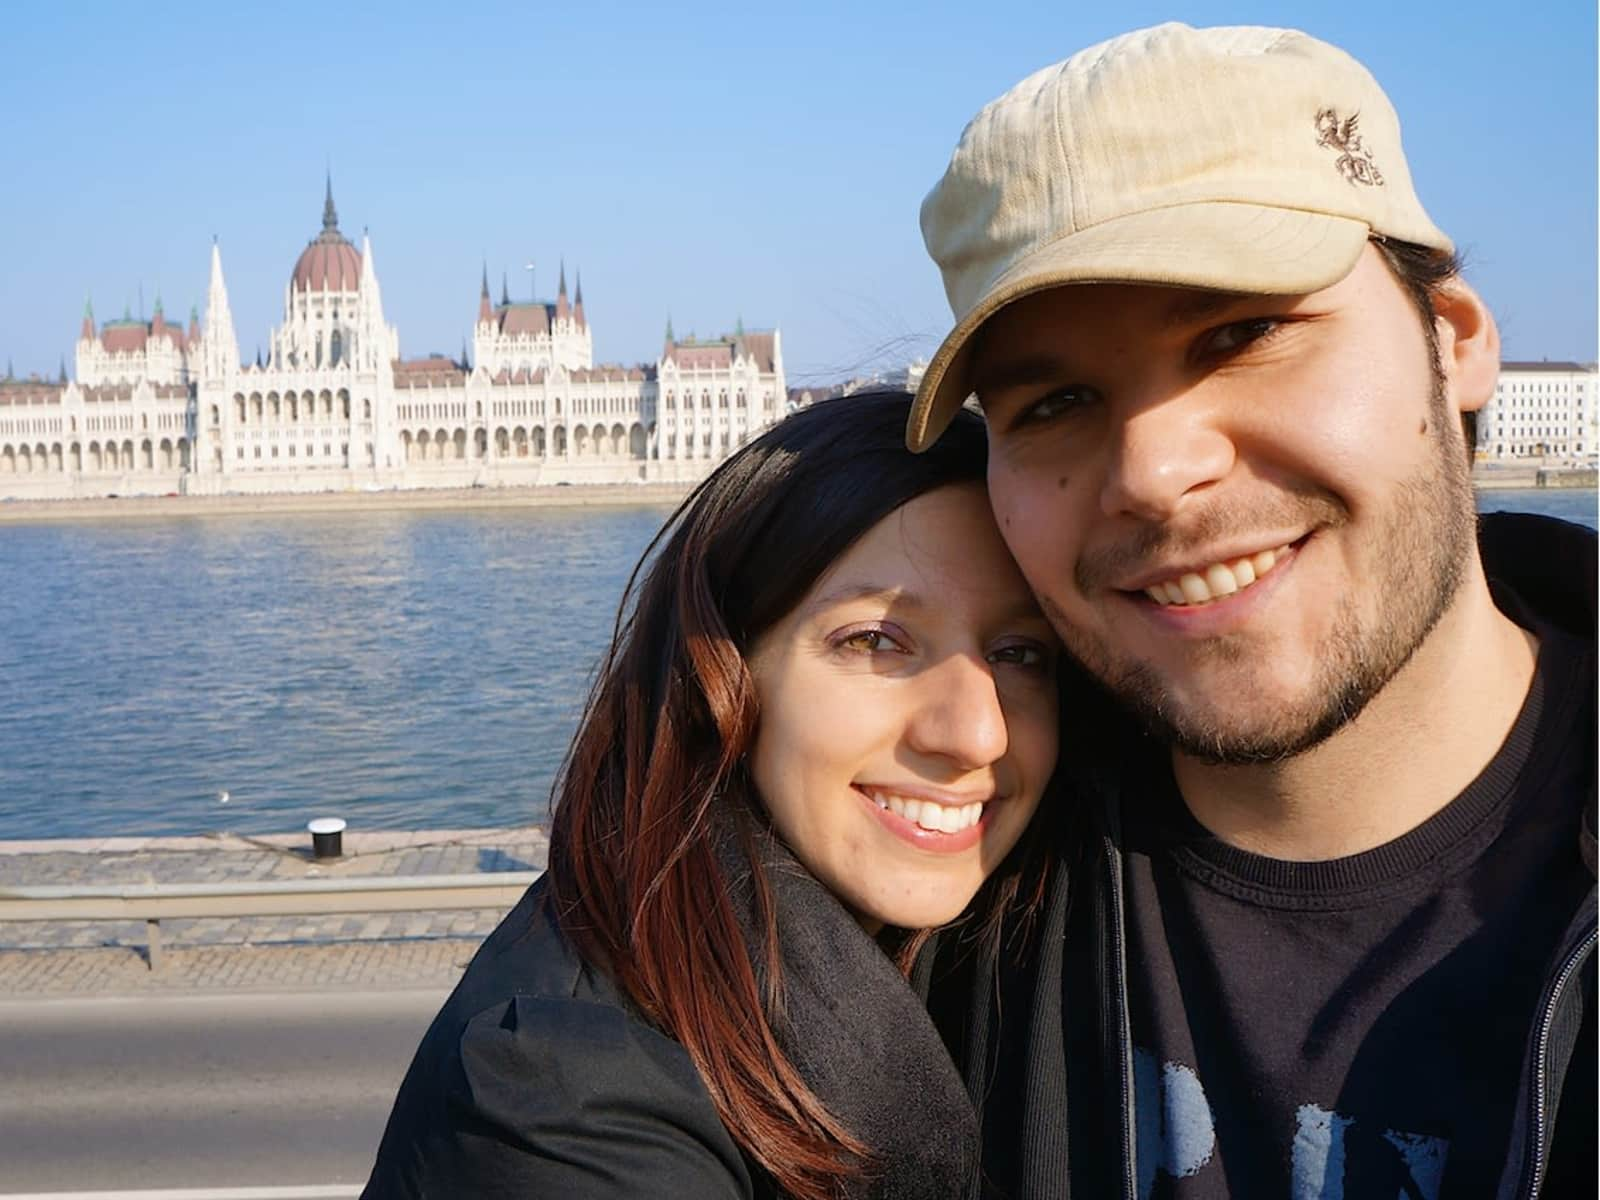 Cristina & Daniel from Toronto, Ontario, Canada